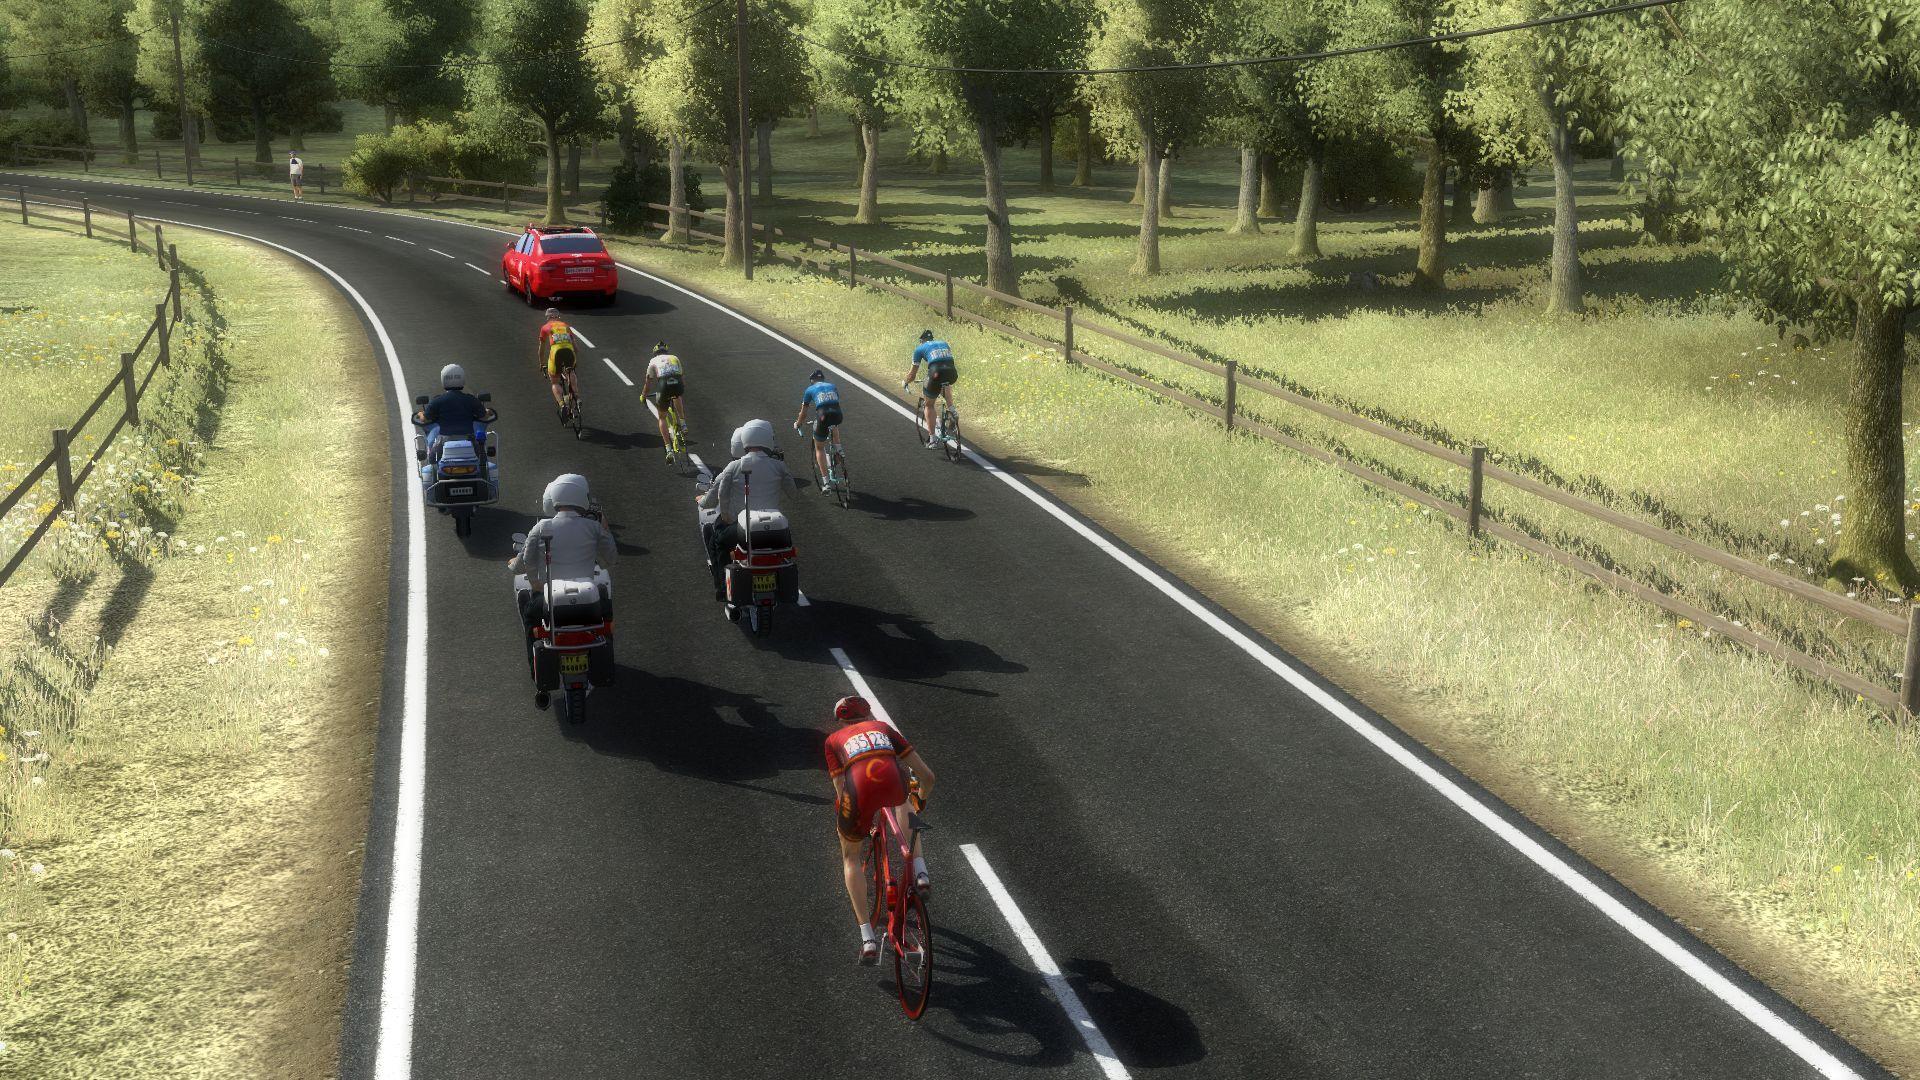 pcmdaily.com/images/mg/2019/Races/PT/Tirreno/mg19_ta_s07_08.jpg